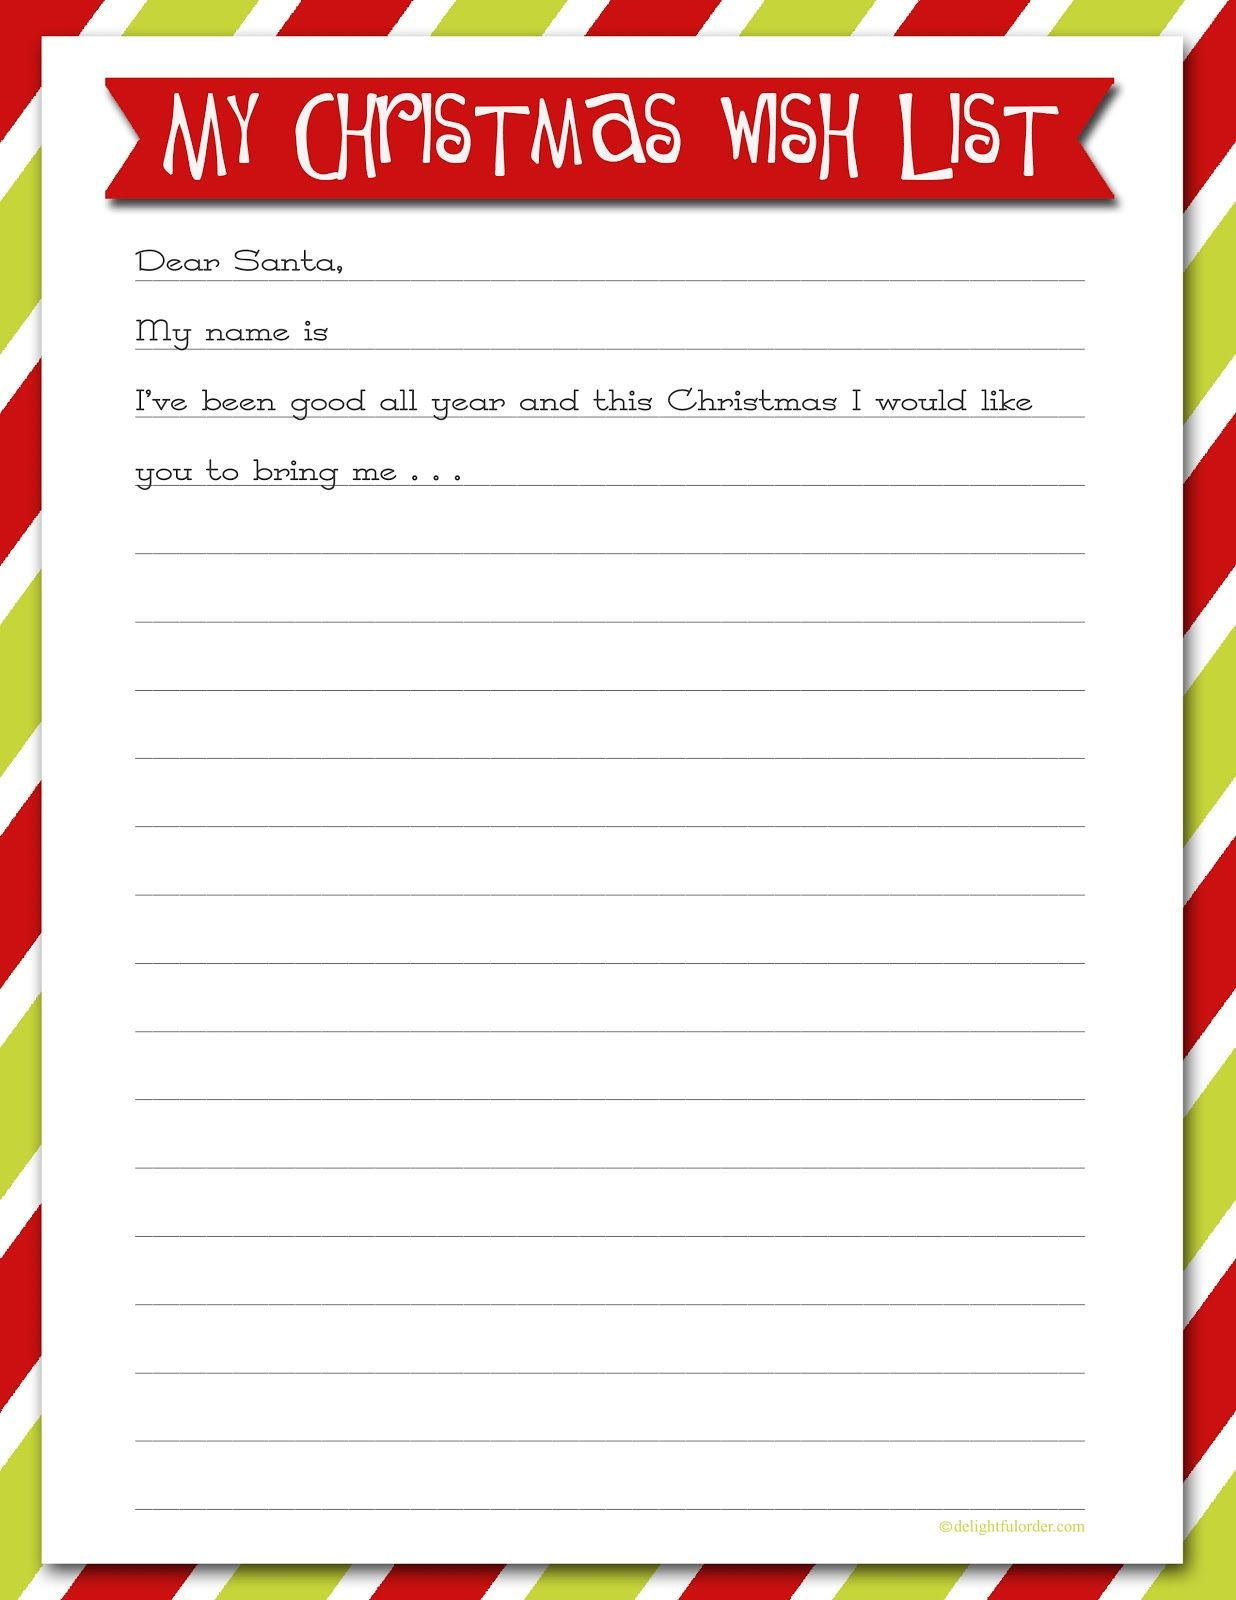 Delightful Order: Christmas Wish List - Free Printable | Delightful - Free Printable Christmas Wish List